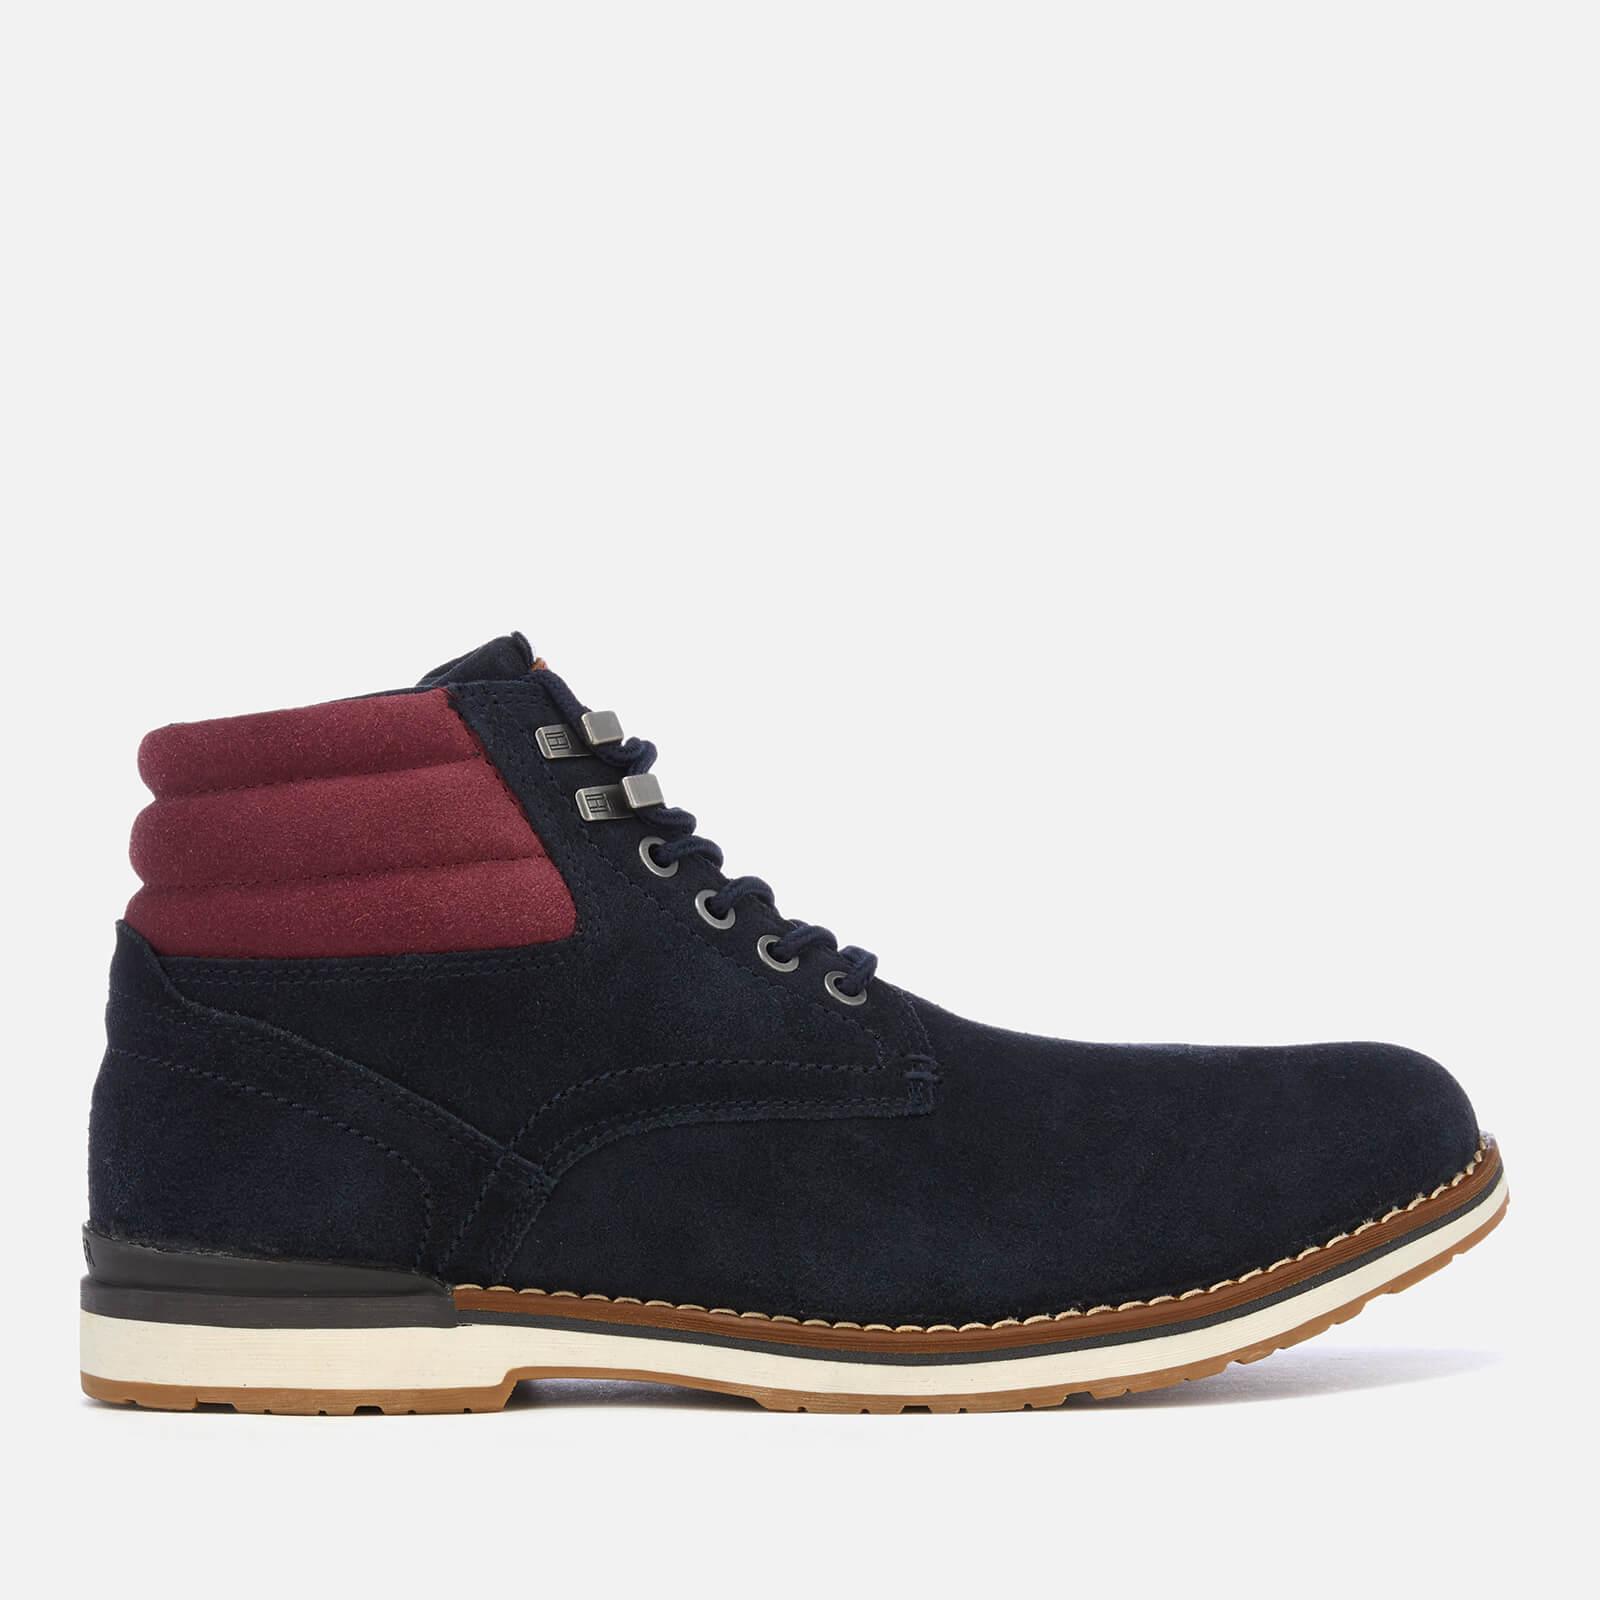 Tommy Hilfiger Men's Outdoor Suede Boots - Midnight - UK 7 - Blue